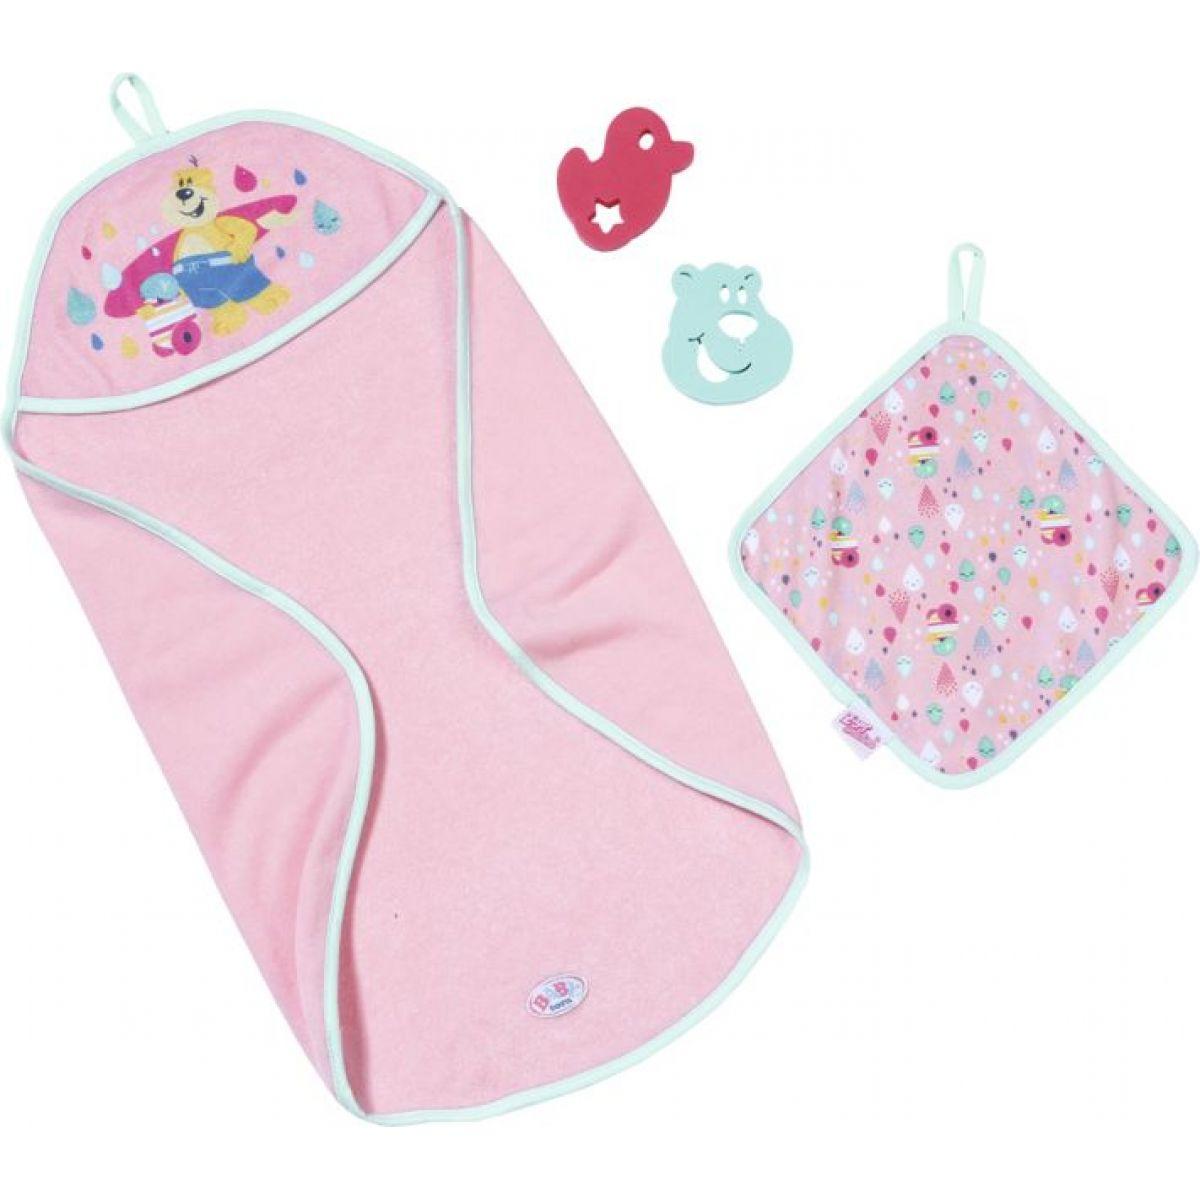 Zapf Creation Baby born ® Súprava s uterákom